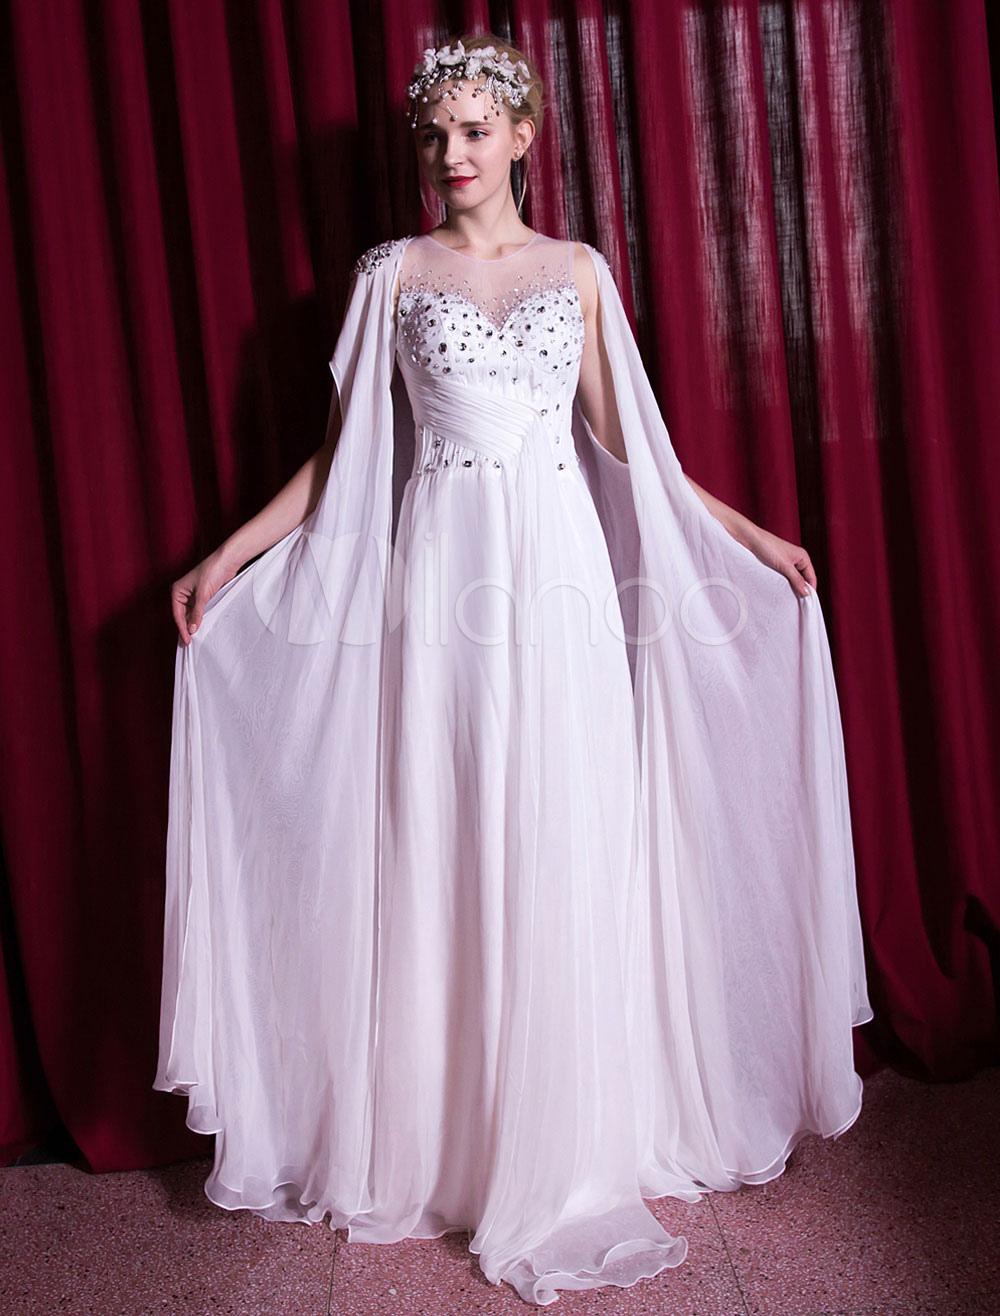 White Evening Dresses Chiffon Rhinestone Beading Pleated Formal Occasion Dress With Cape (Wedding) photo